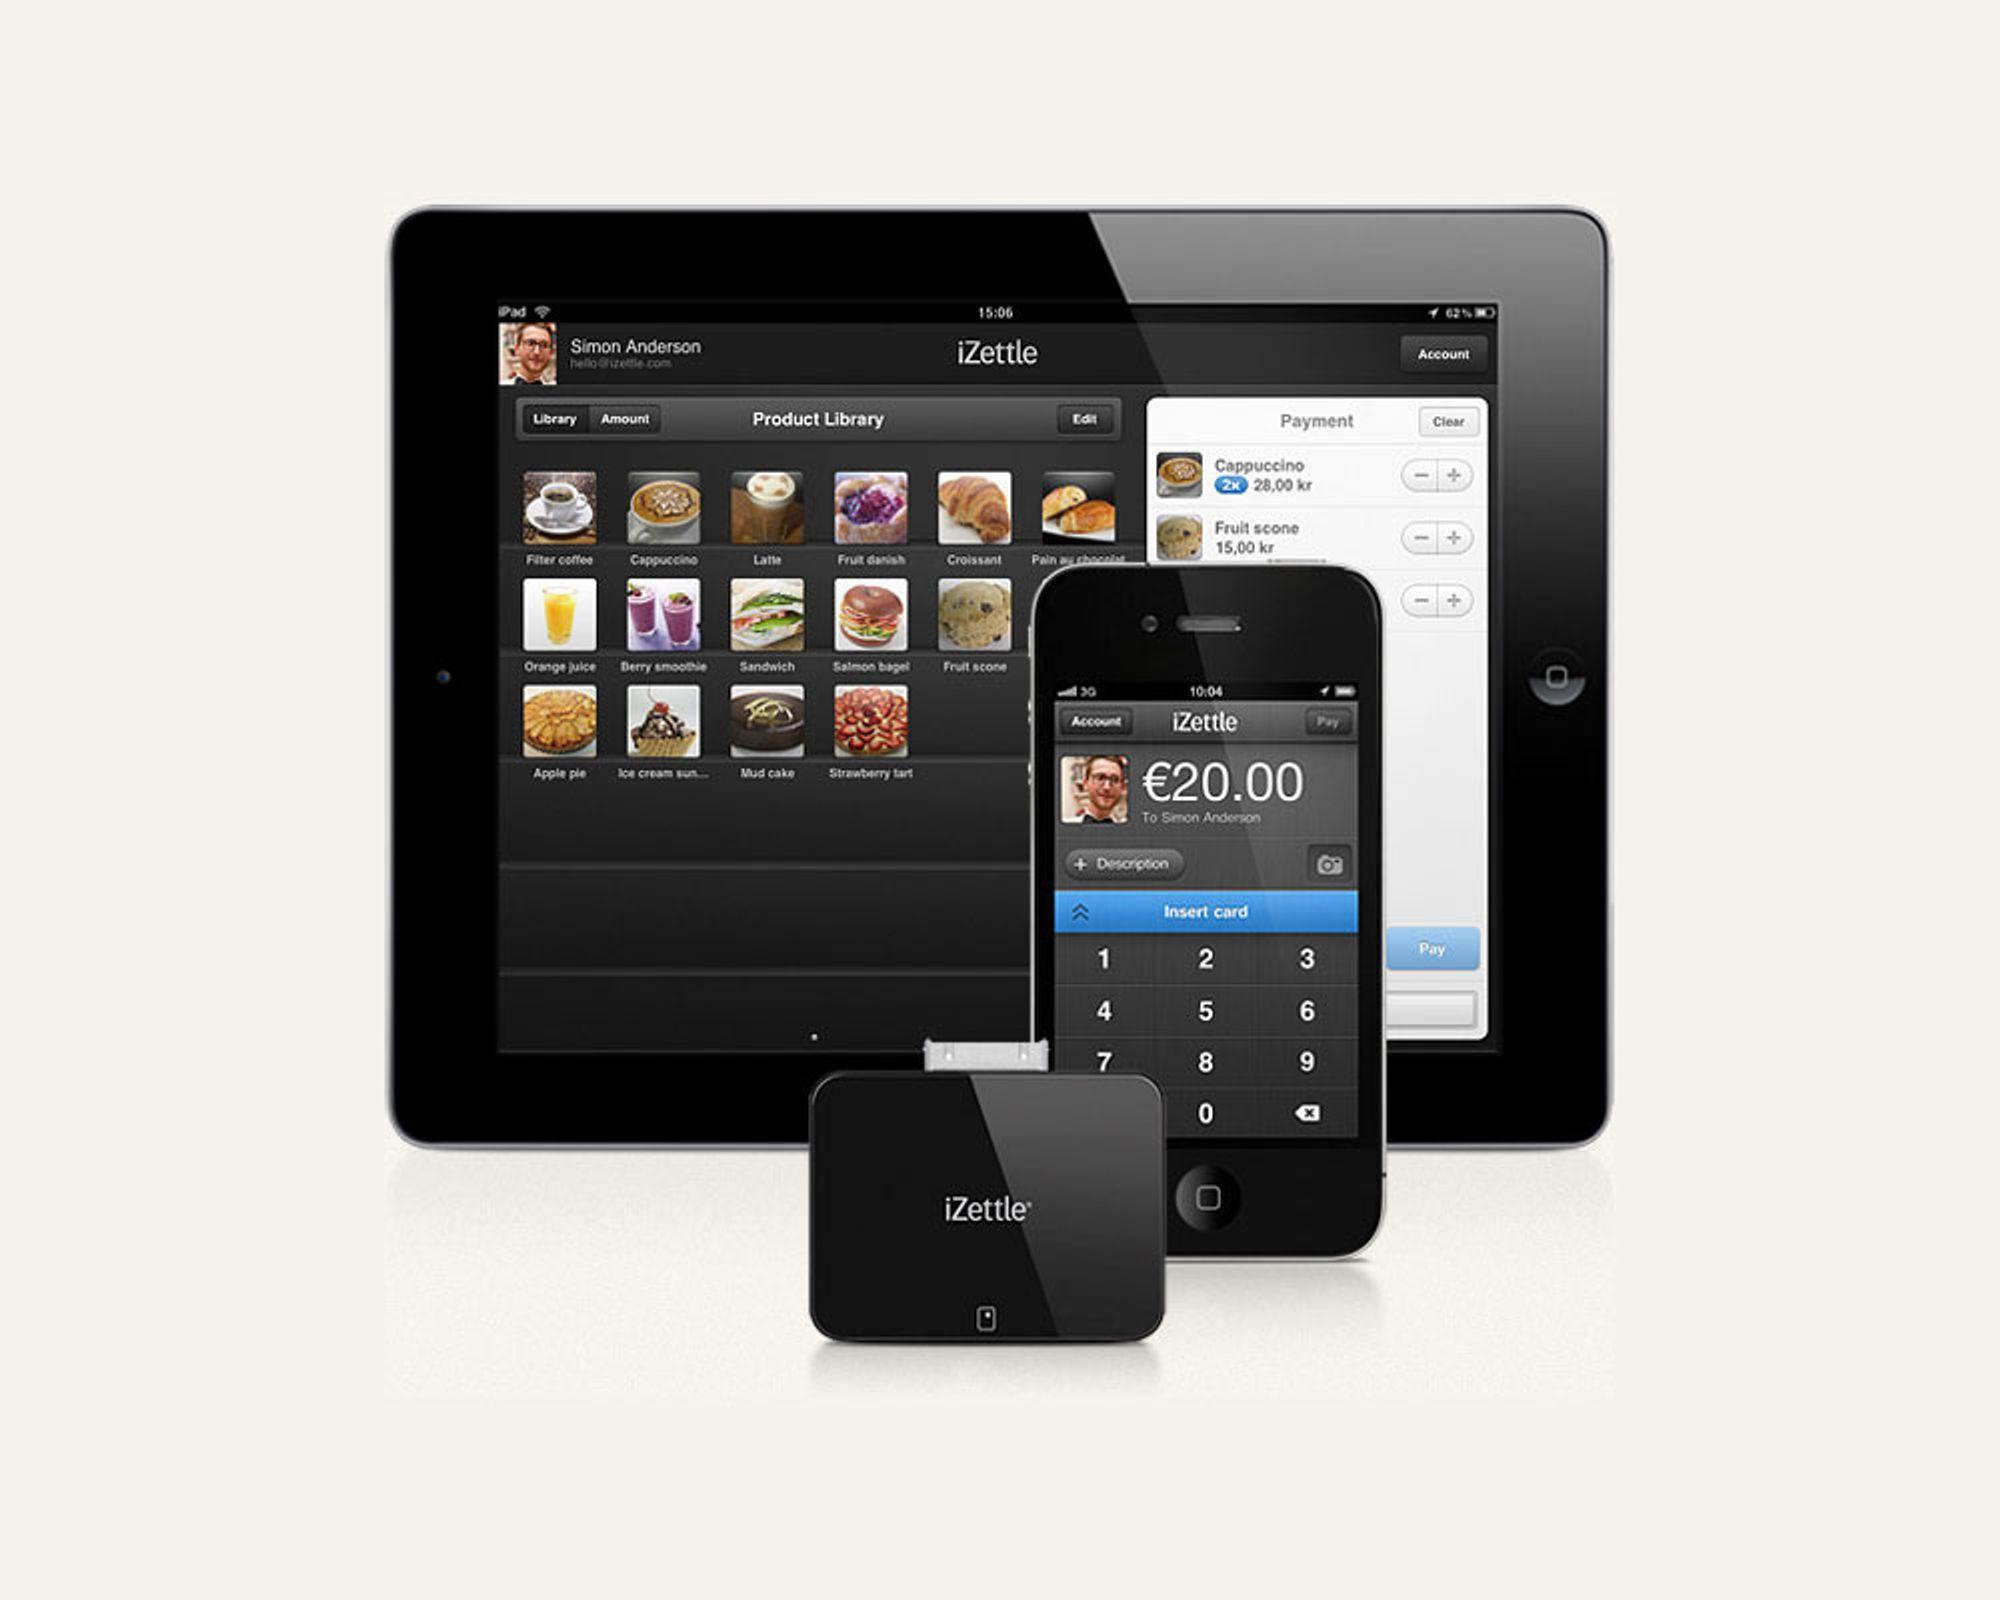 Nå kan du ta kort med din iPhone